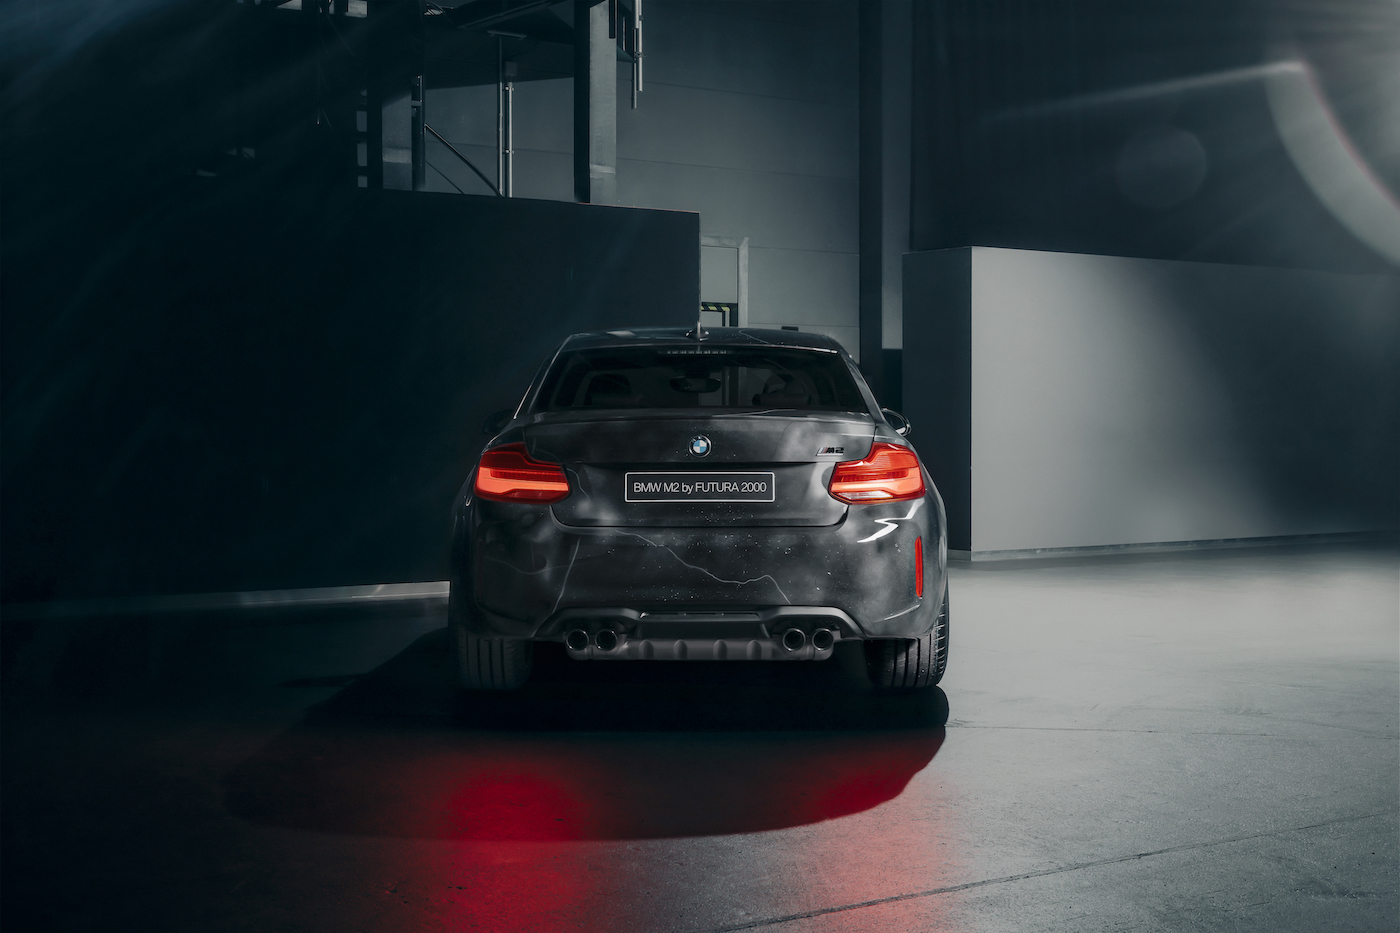 BMW x FUTURA 2000: Exklusive Sondermodelle des BMW M2 Competition 9